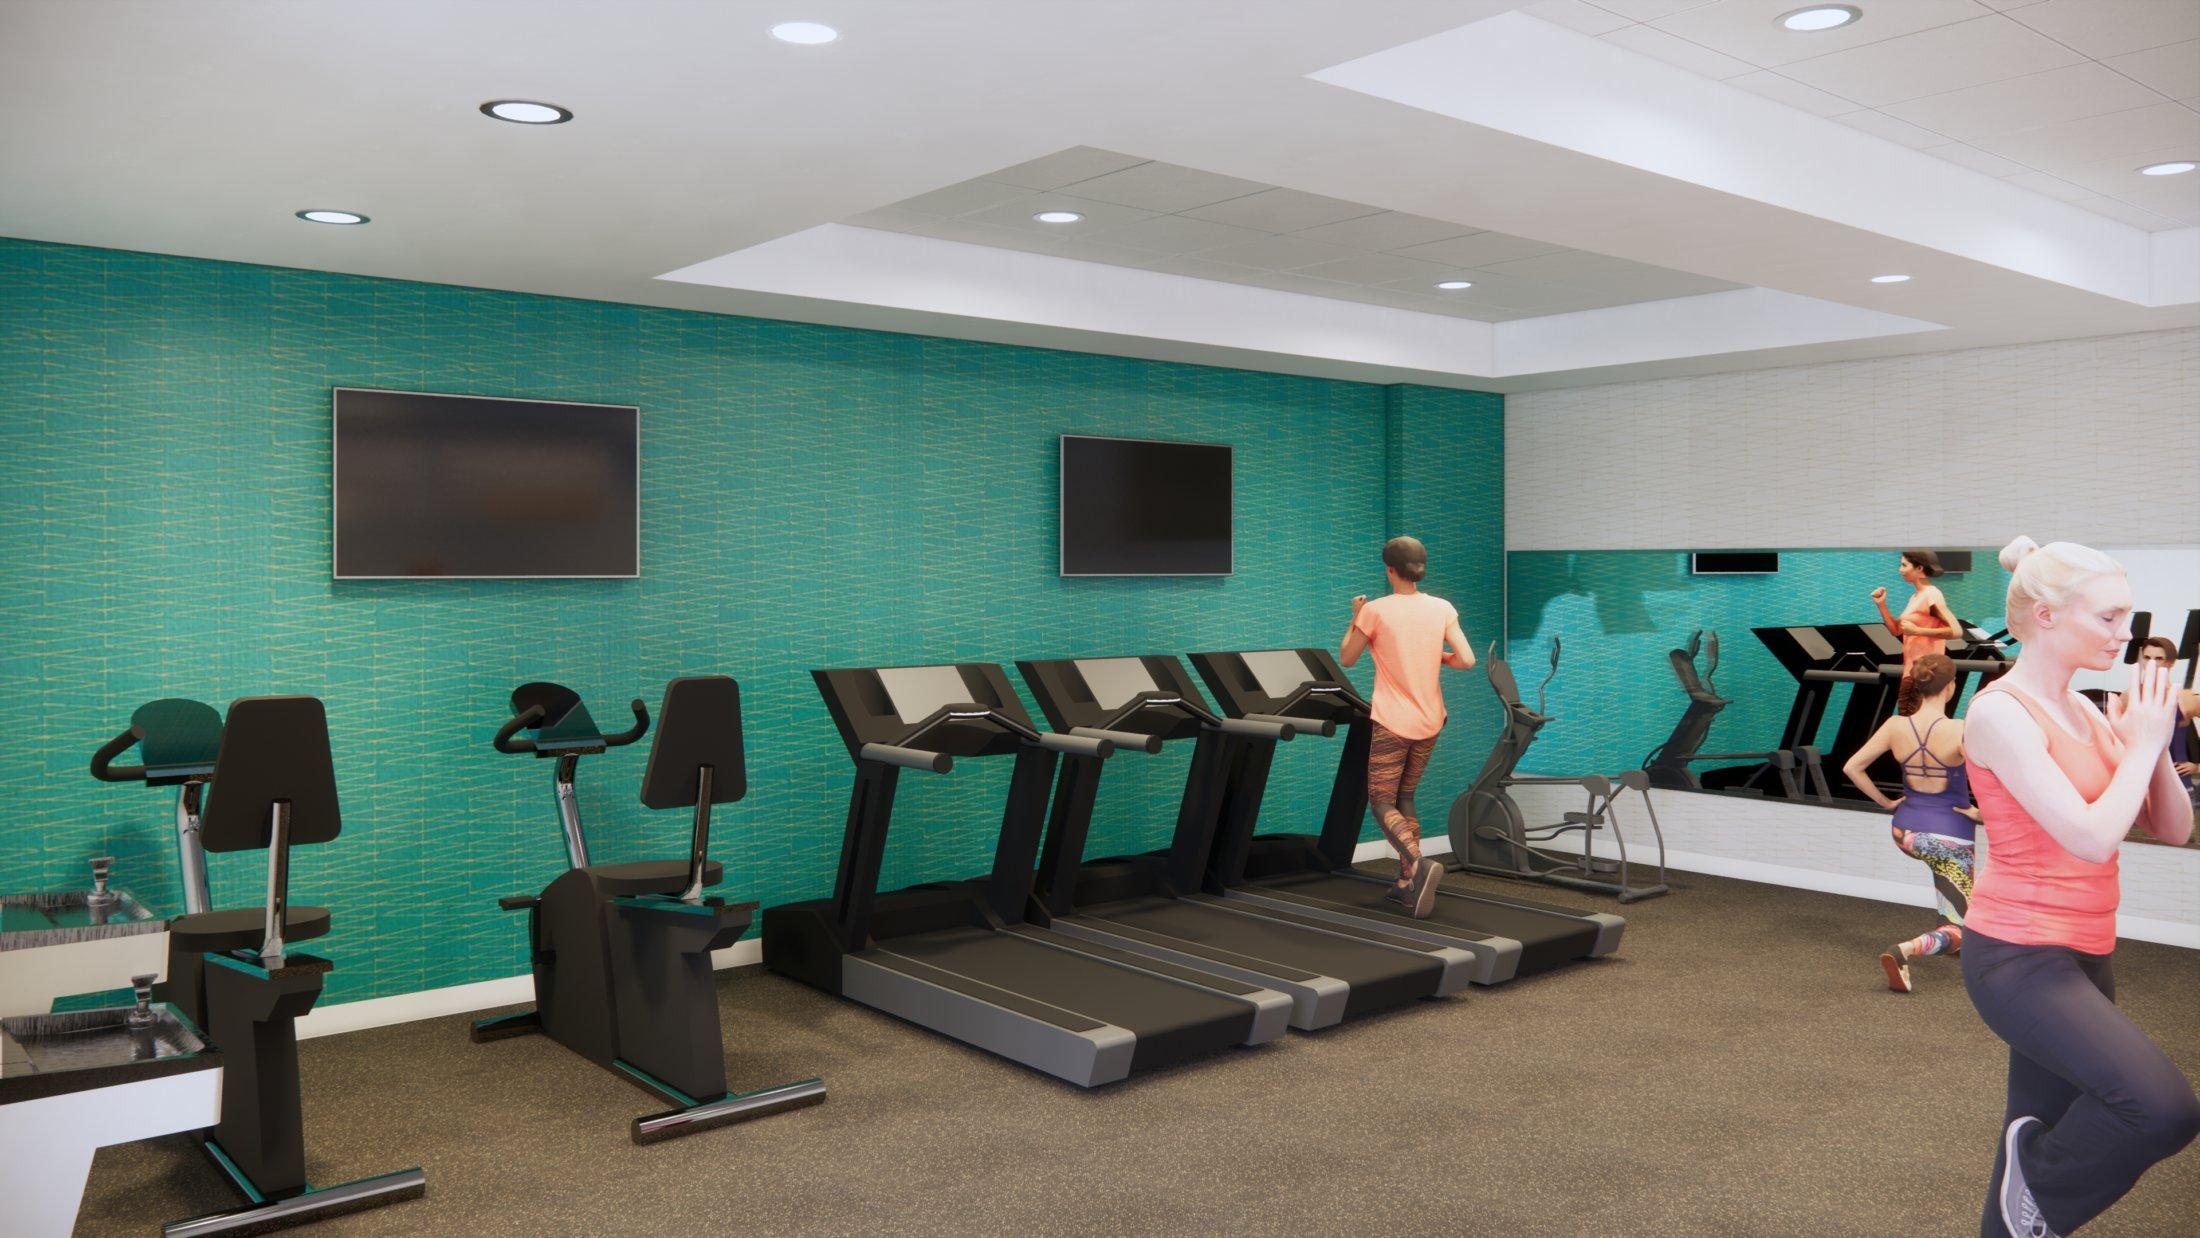 08 Fitness Room